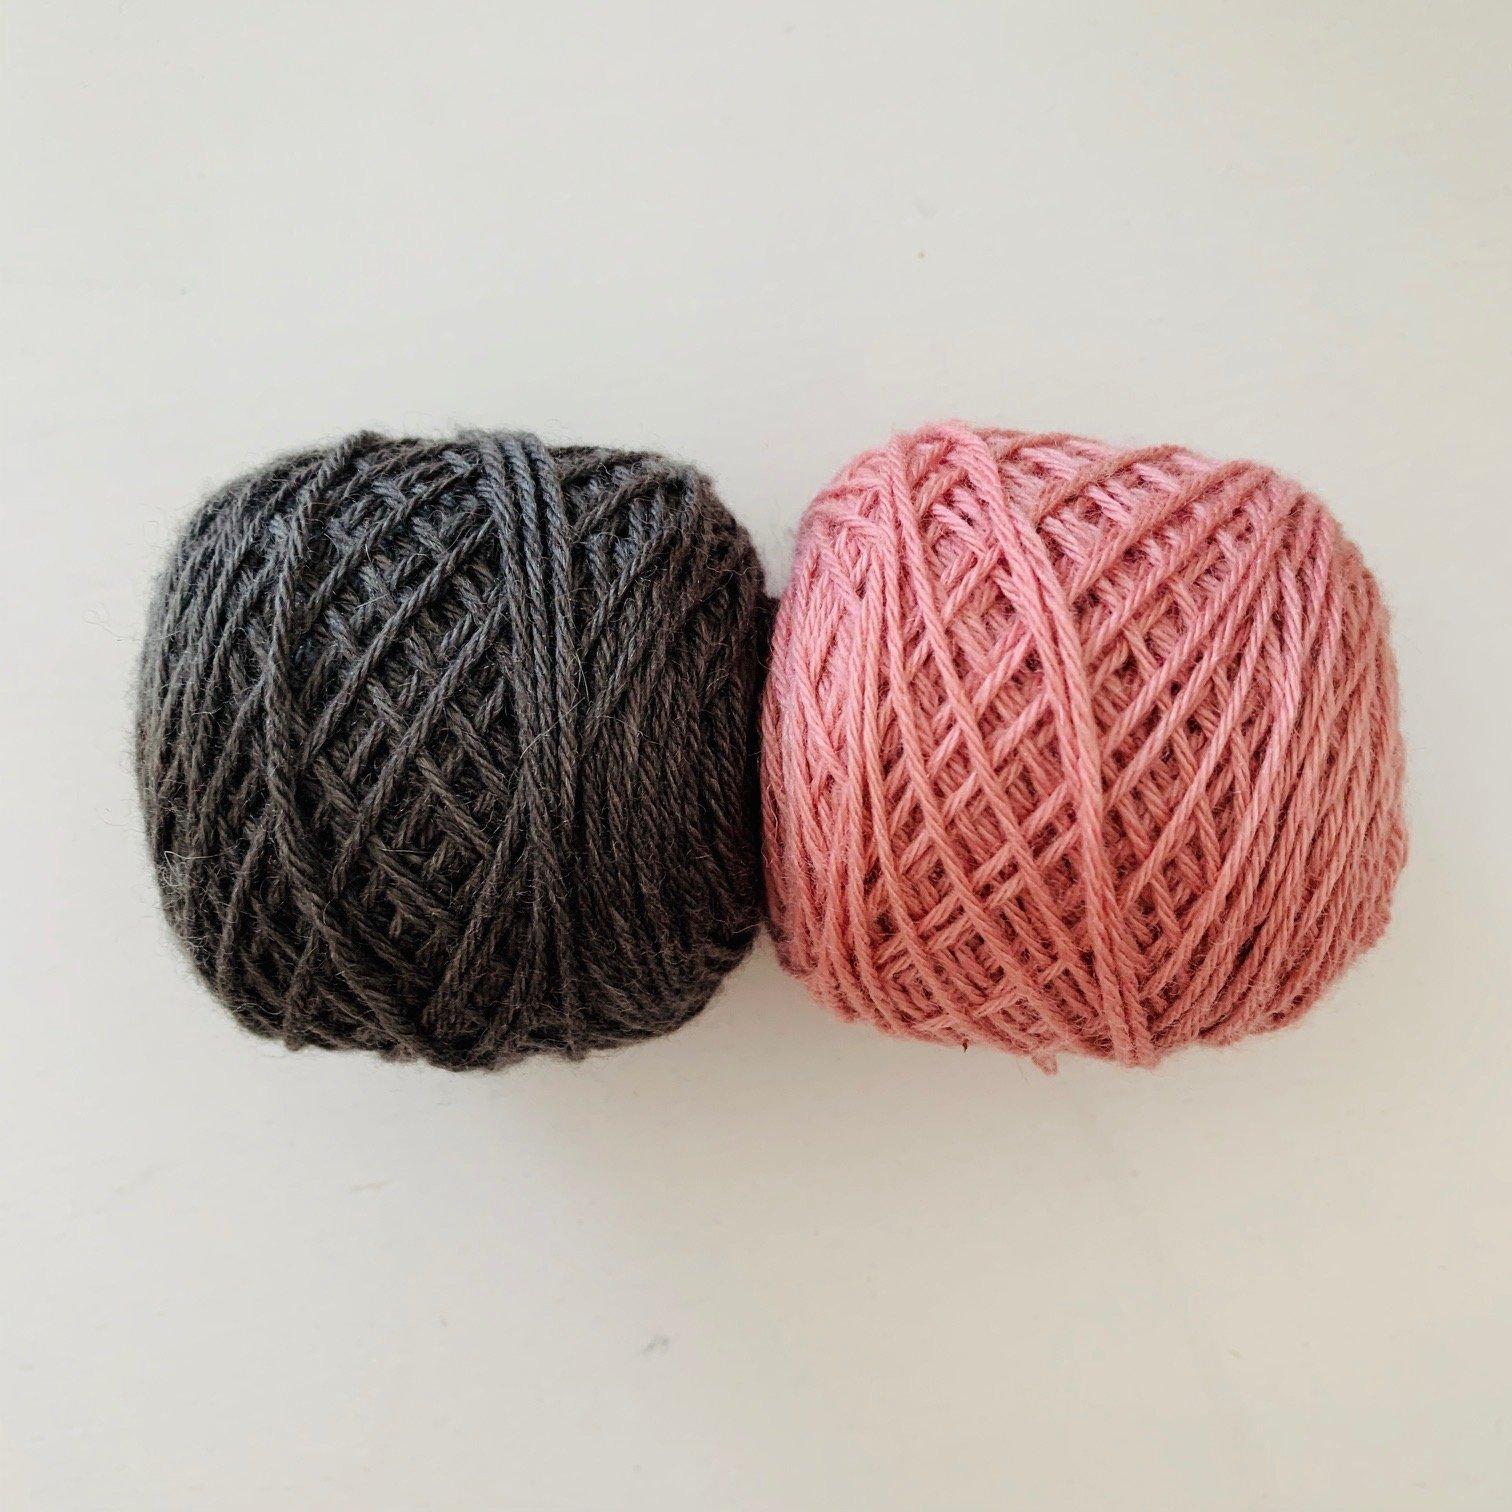 Ochre Yarn - Classic Socks - Kit